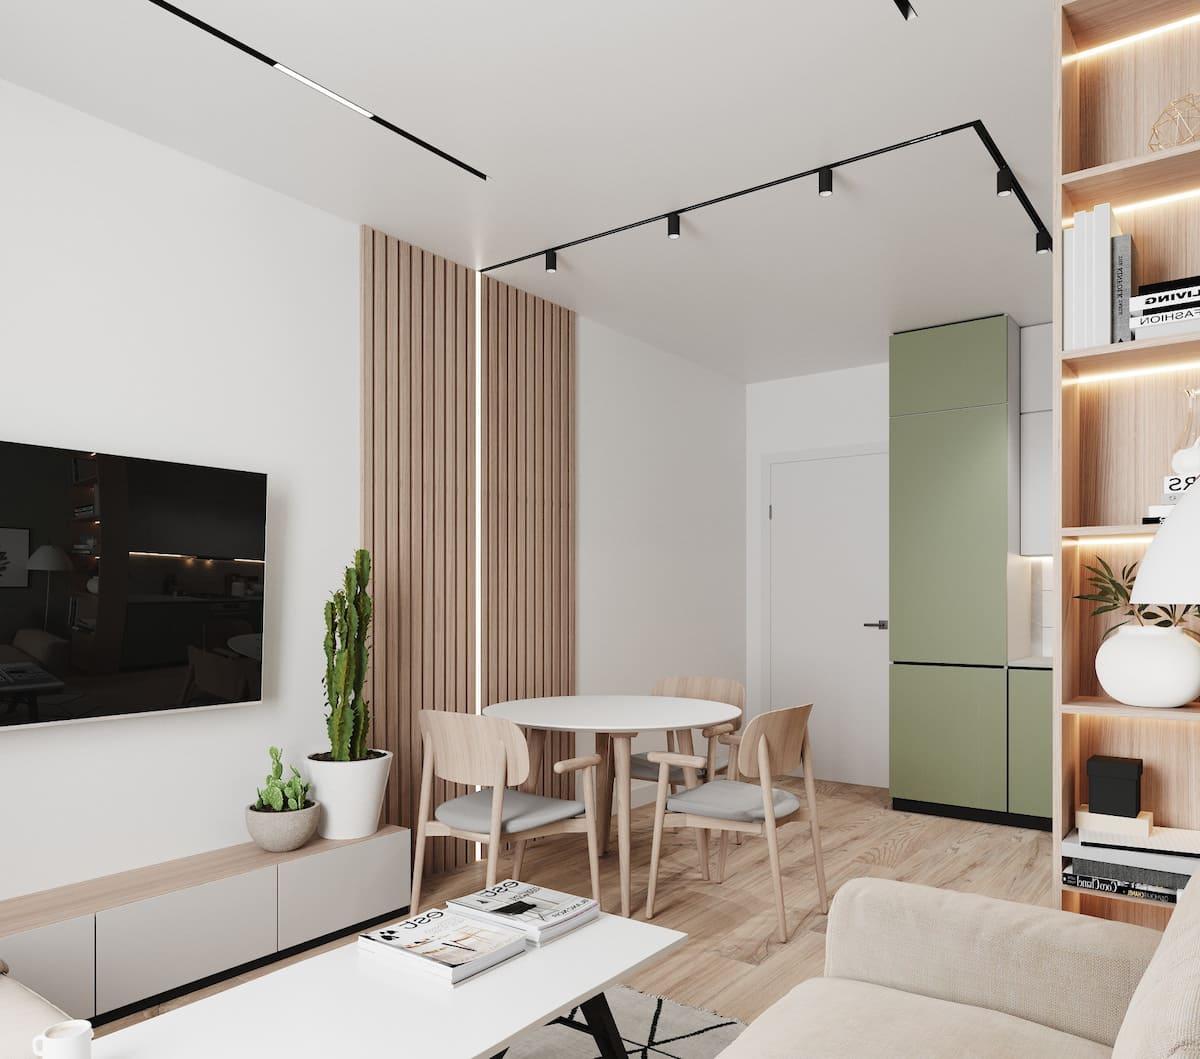 дизайн интерьера модной квартиры фото 87